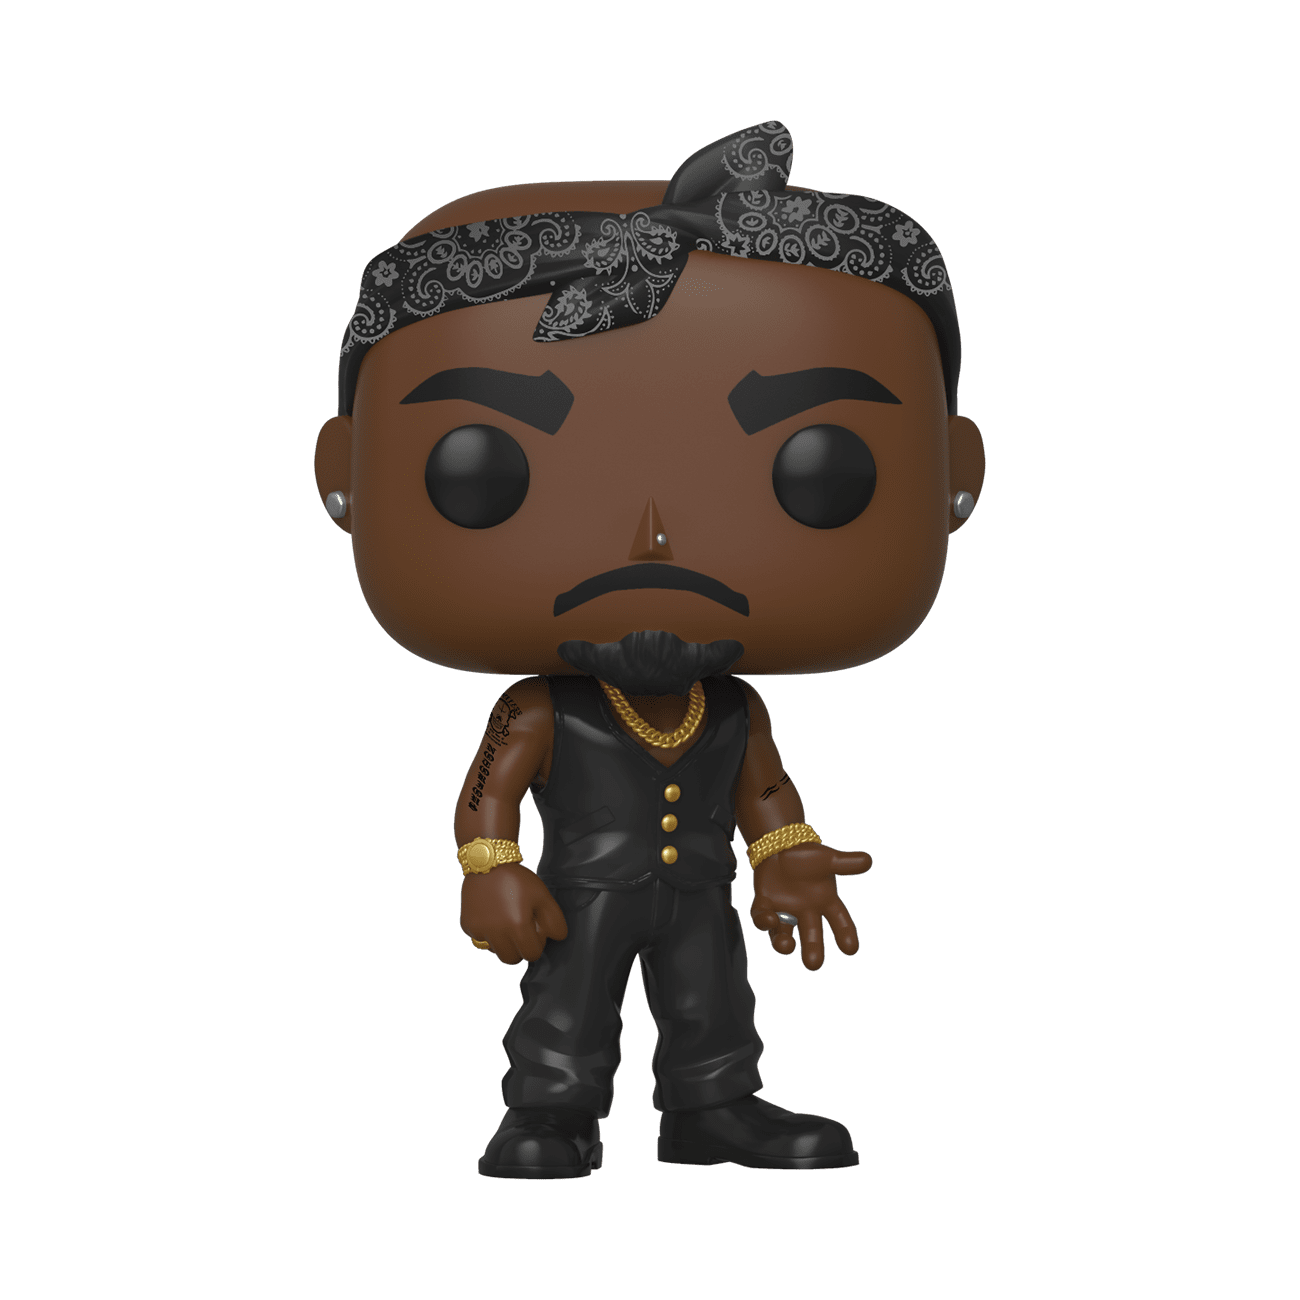 Funko Pops! tupac shakur new